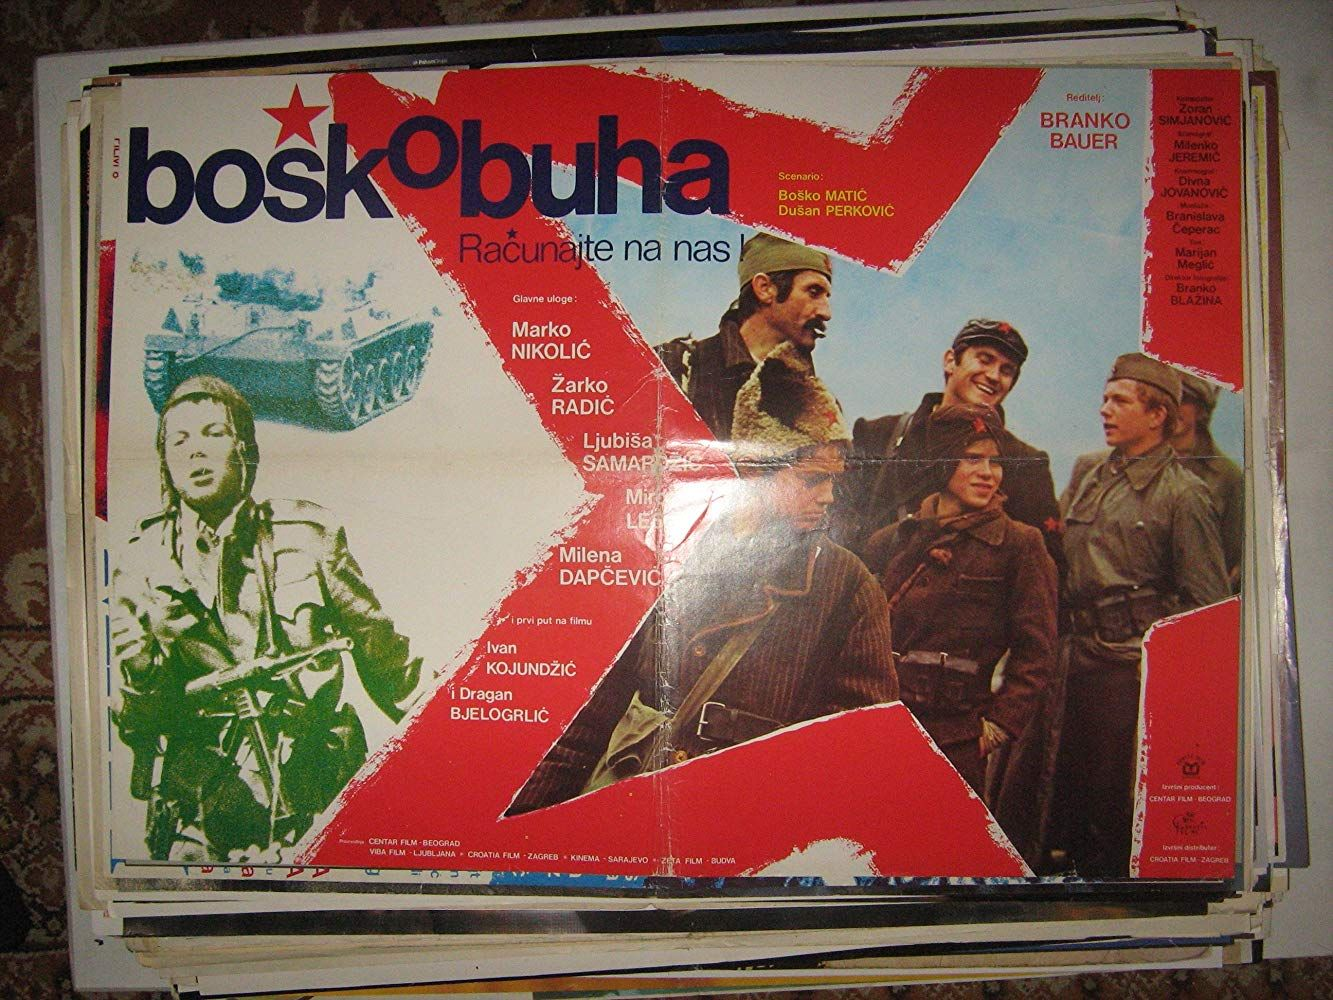 Bosko Buha (1978) Buy movies, Historical events